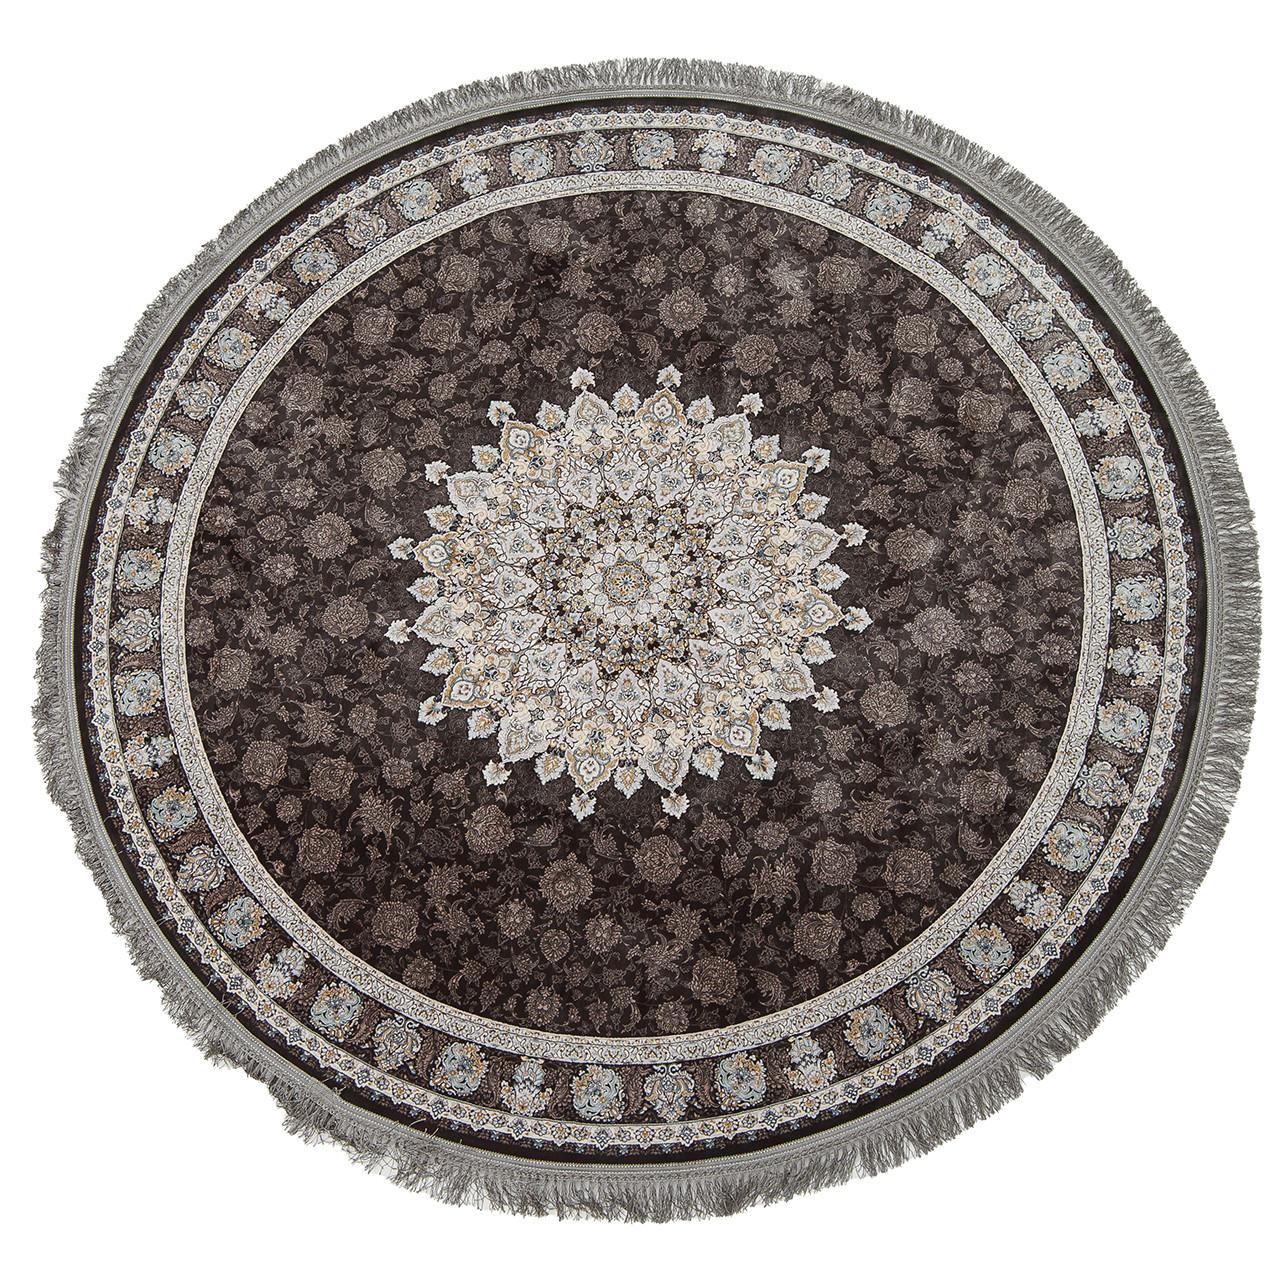 Коврик восточная классика XYPPEM G253 1,5Х1,5 СЕРЫЙ круг